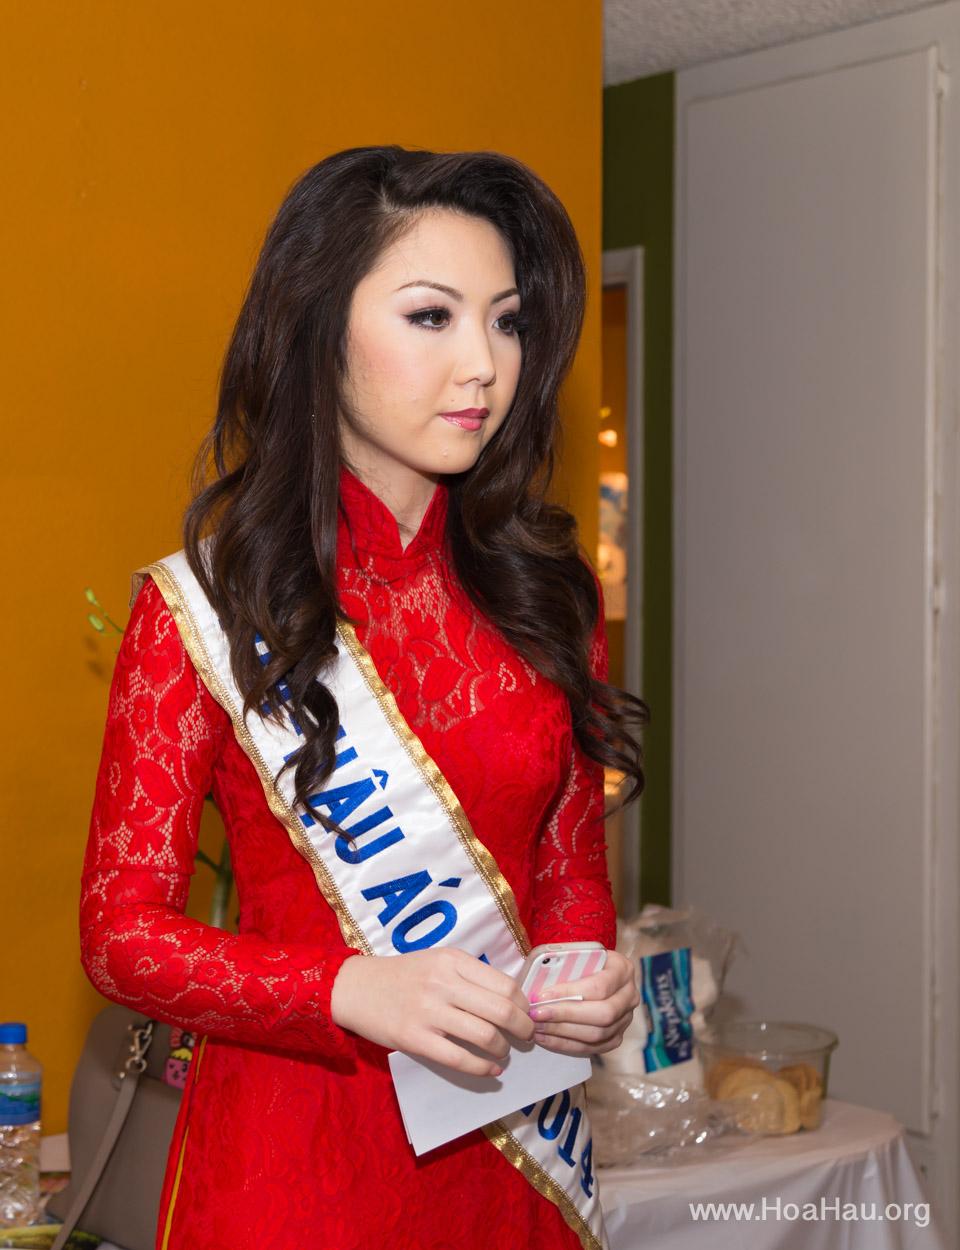 Tet Festival 2014 at Vietnam Town - Hoa Hau - Miss Vietnam - Image 103